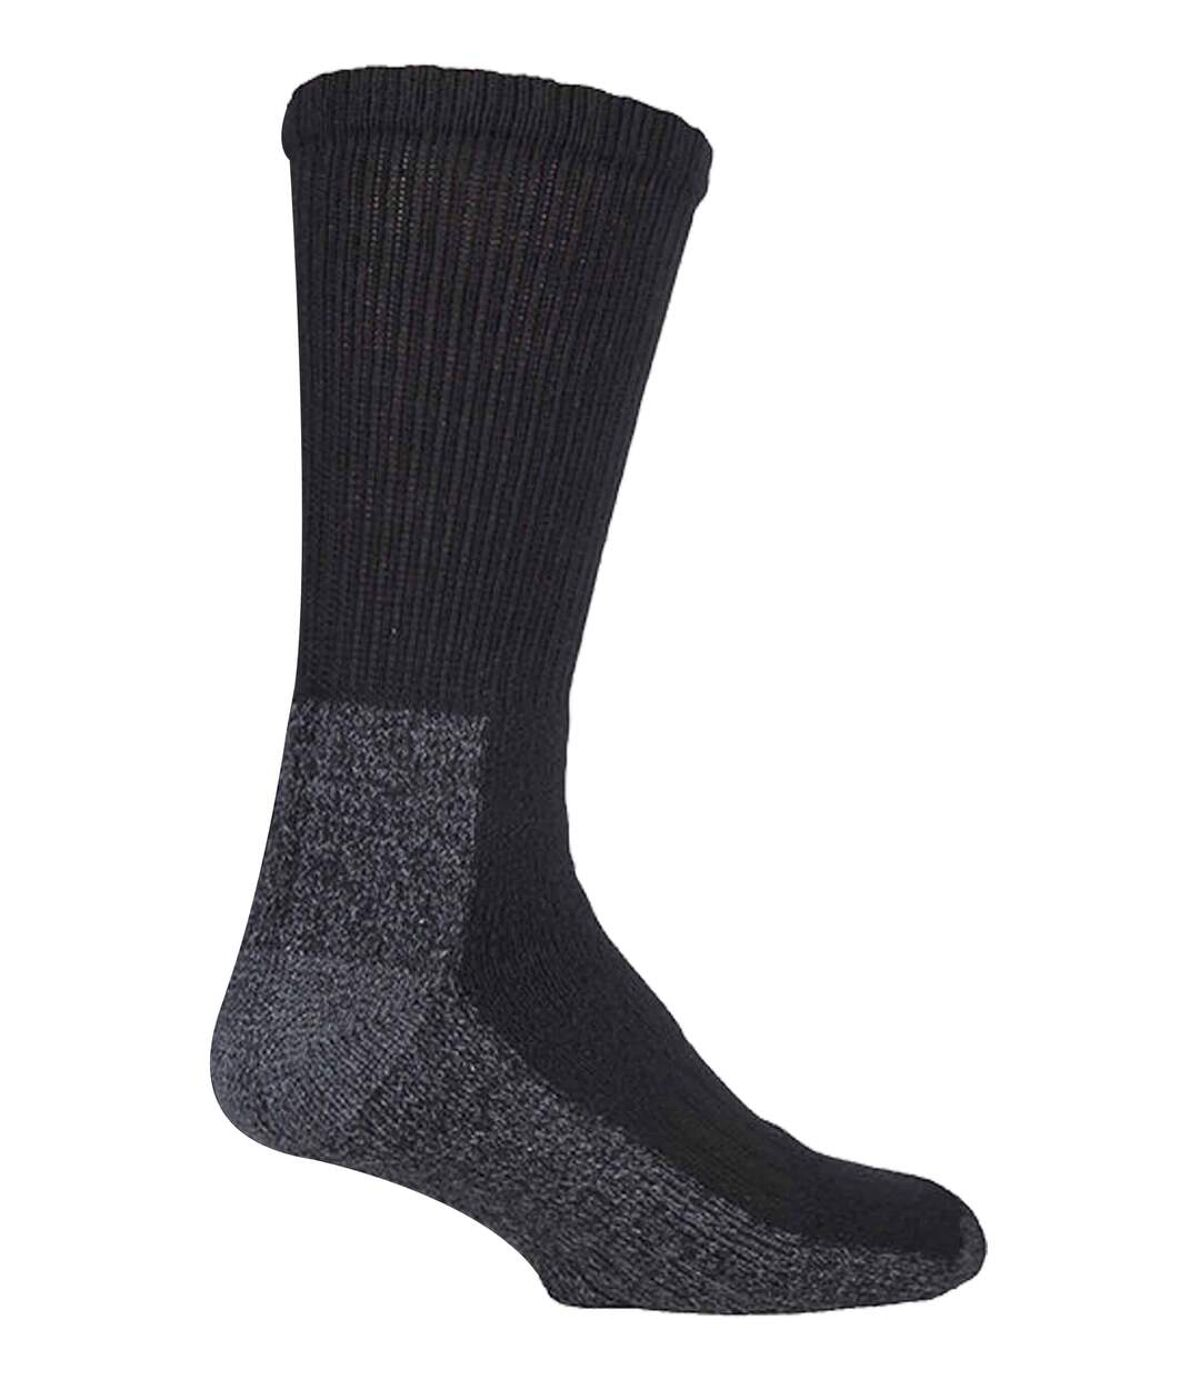 Mens 3 Pk Heavy Duty Work Socks for Work Boots